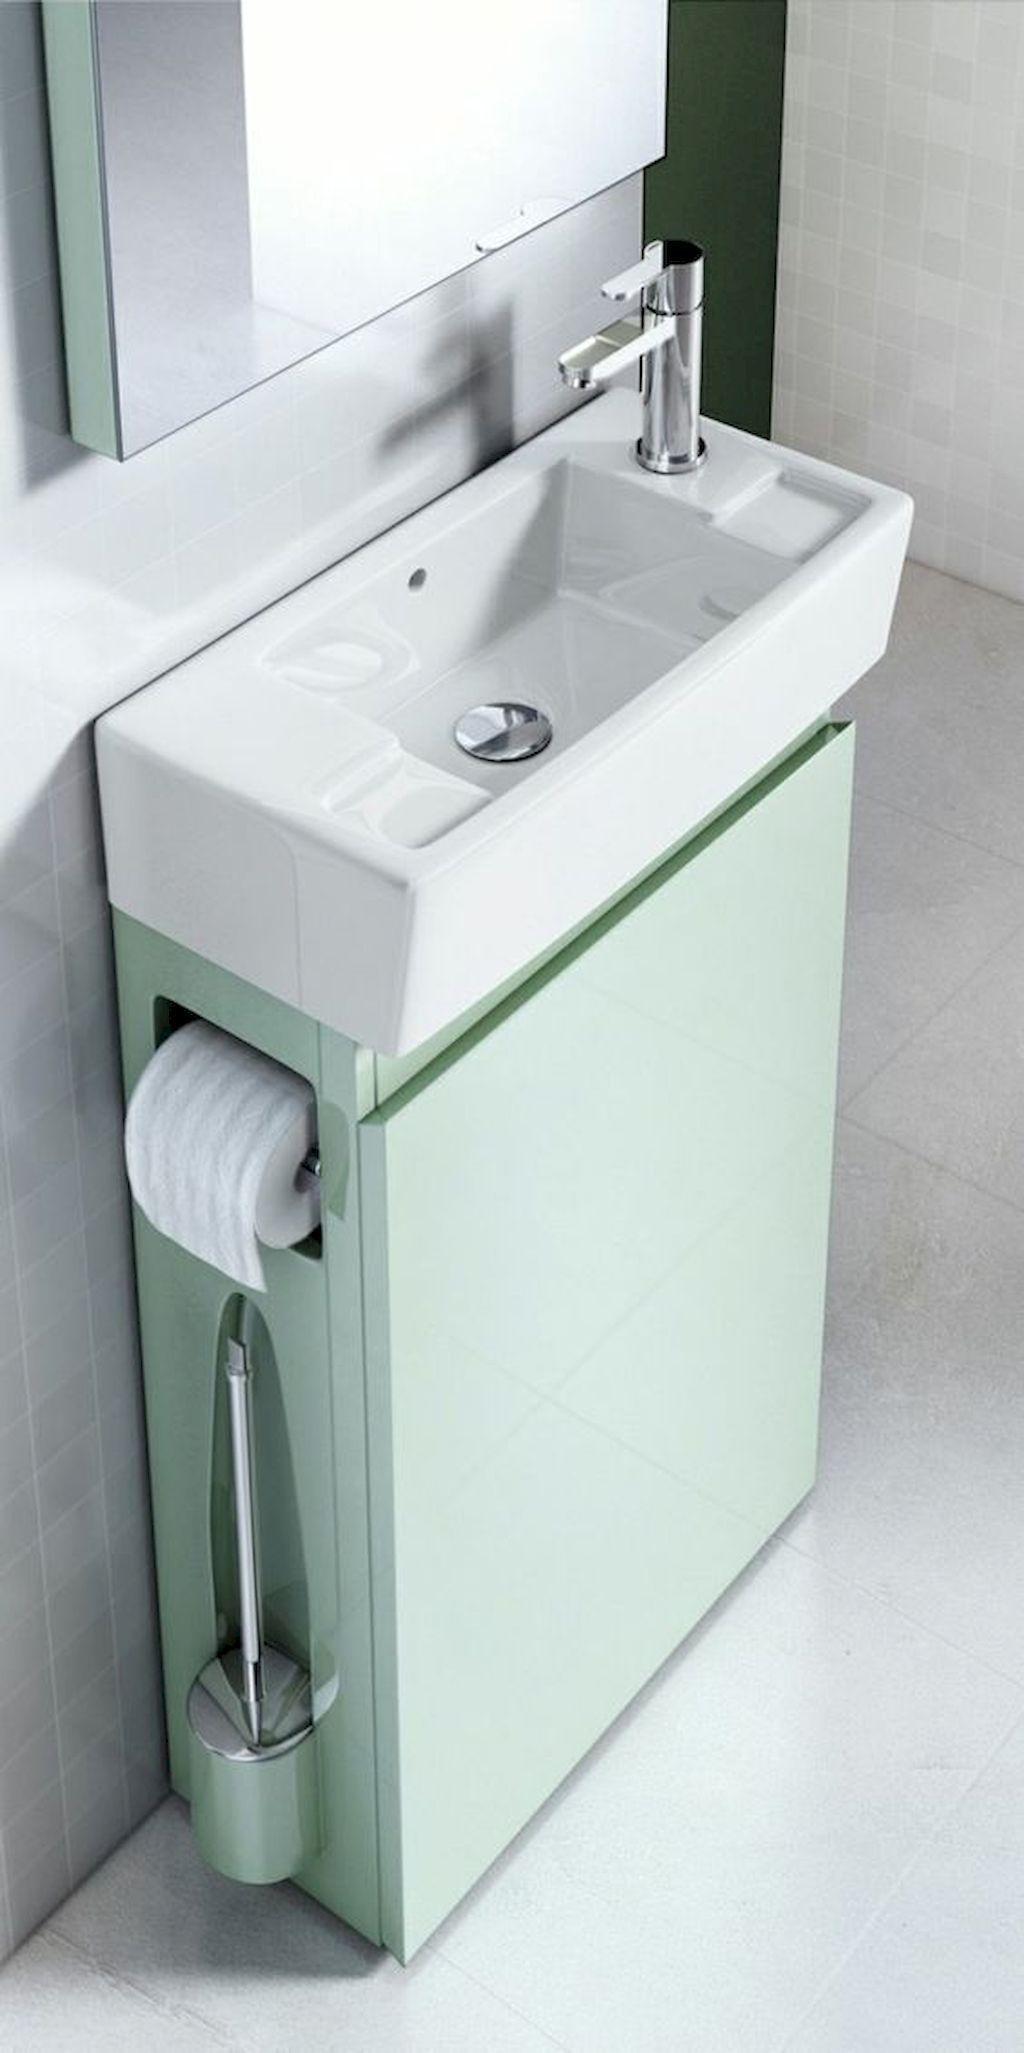 Nice 52 Wonderful Small Rv Bathroom Toilet Remodel Ideas More At Https Homedecorizz Com 2018 Small Bathroom Storage Space Saving Bathroom Tiny House Storage